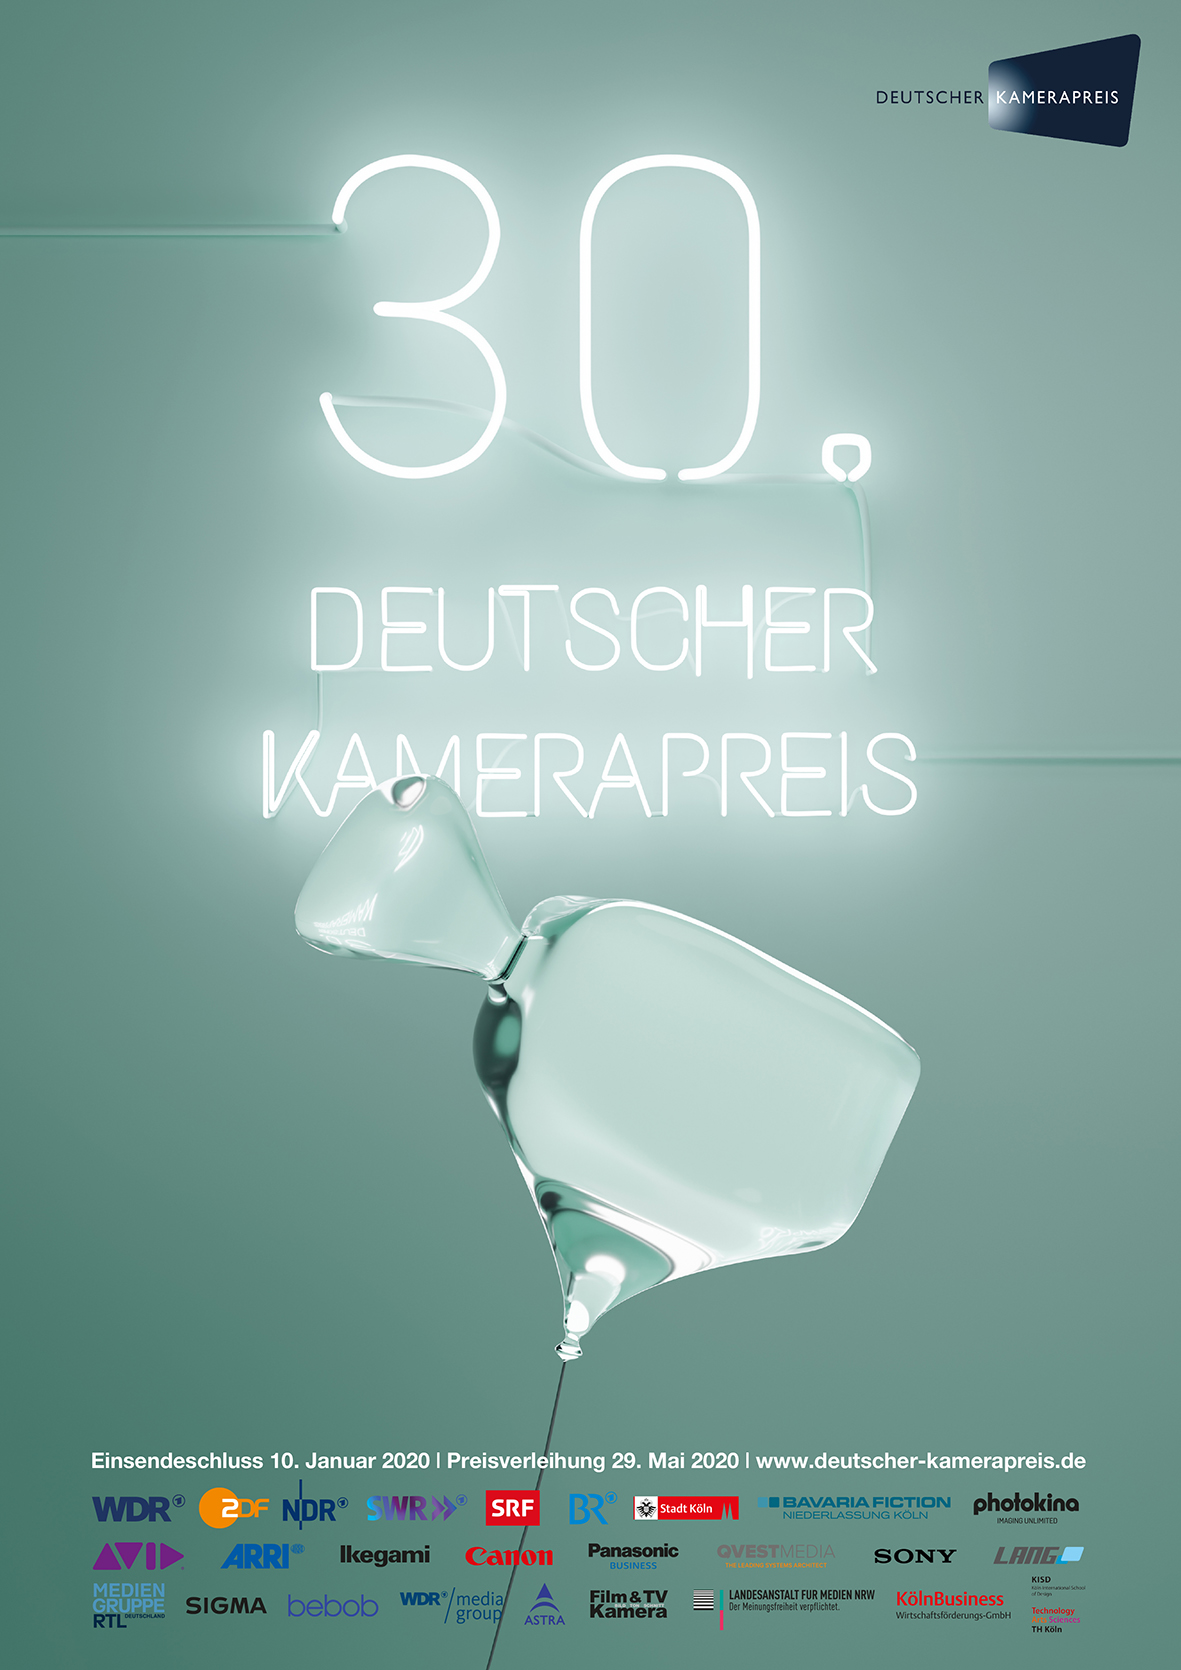 bebob ist Sponsor des Deutschen Kamerapreises